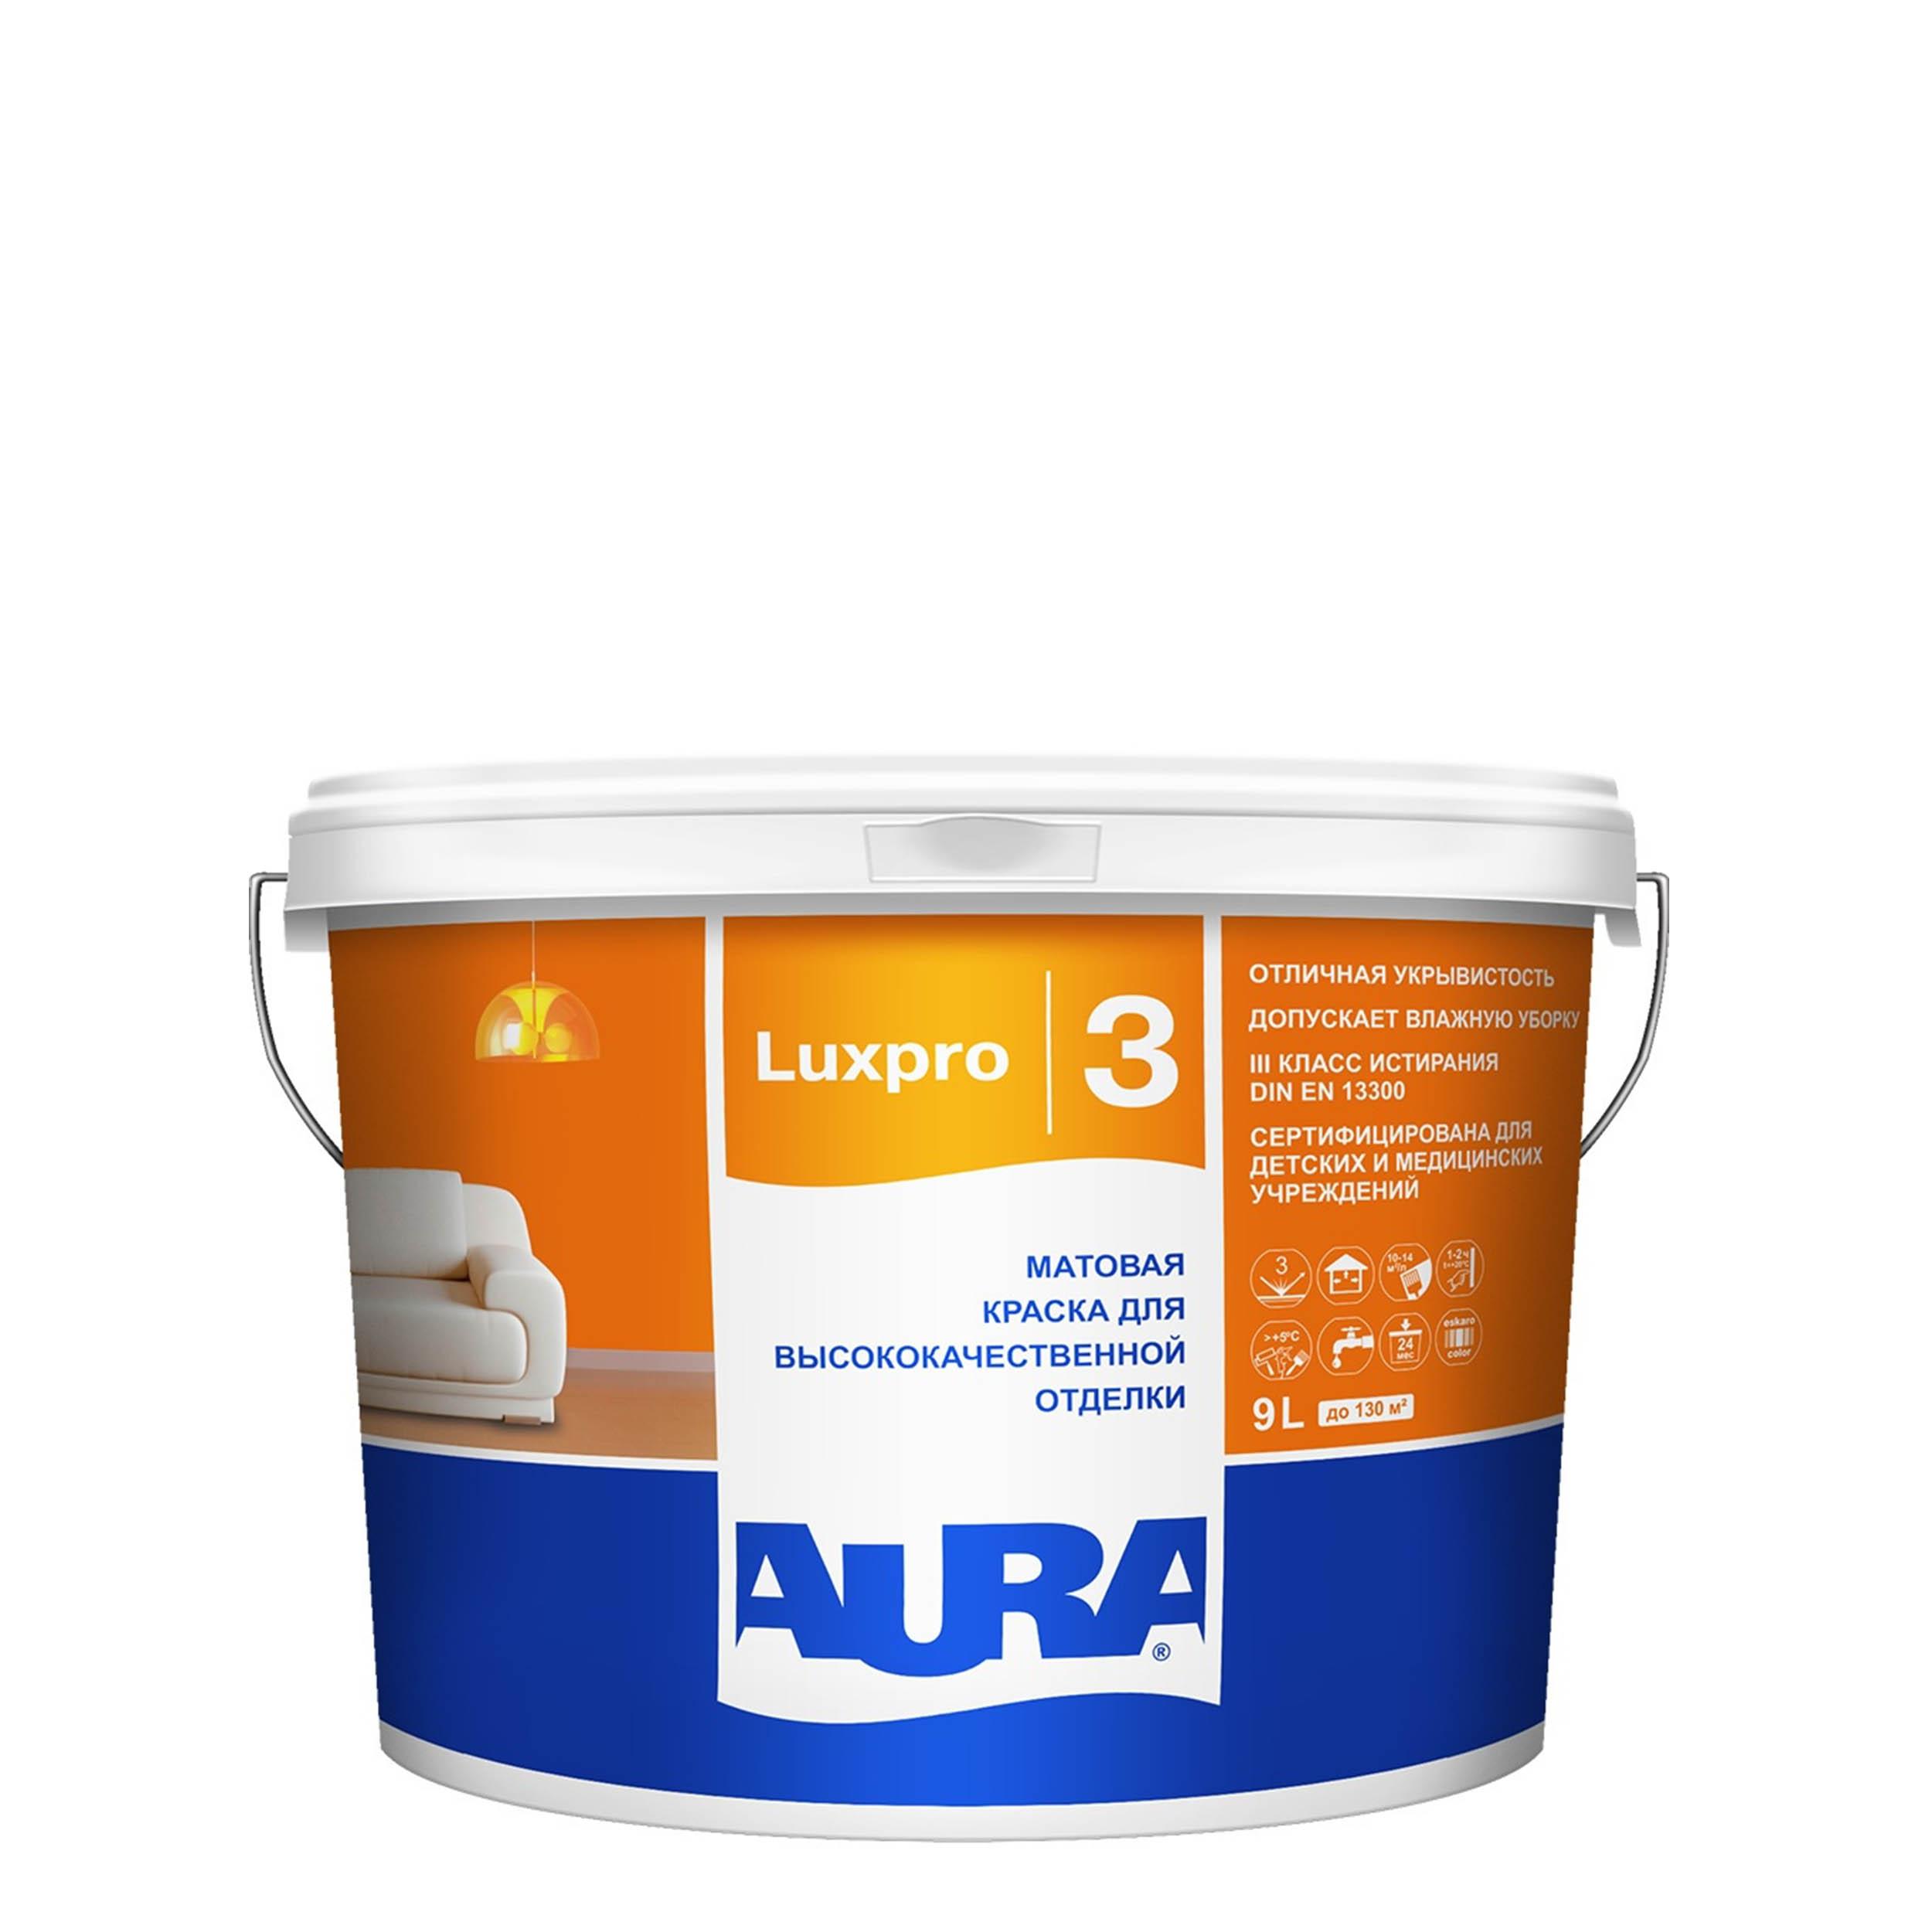 Фото 3 - Краска интерьерная, Aura LuxPRO 3, RAL 9018, 11 кг.